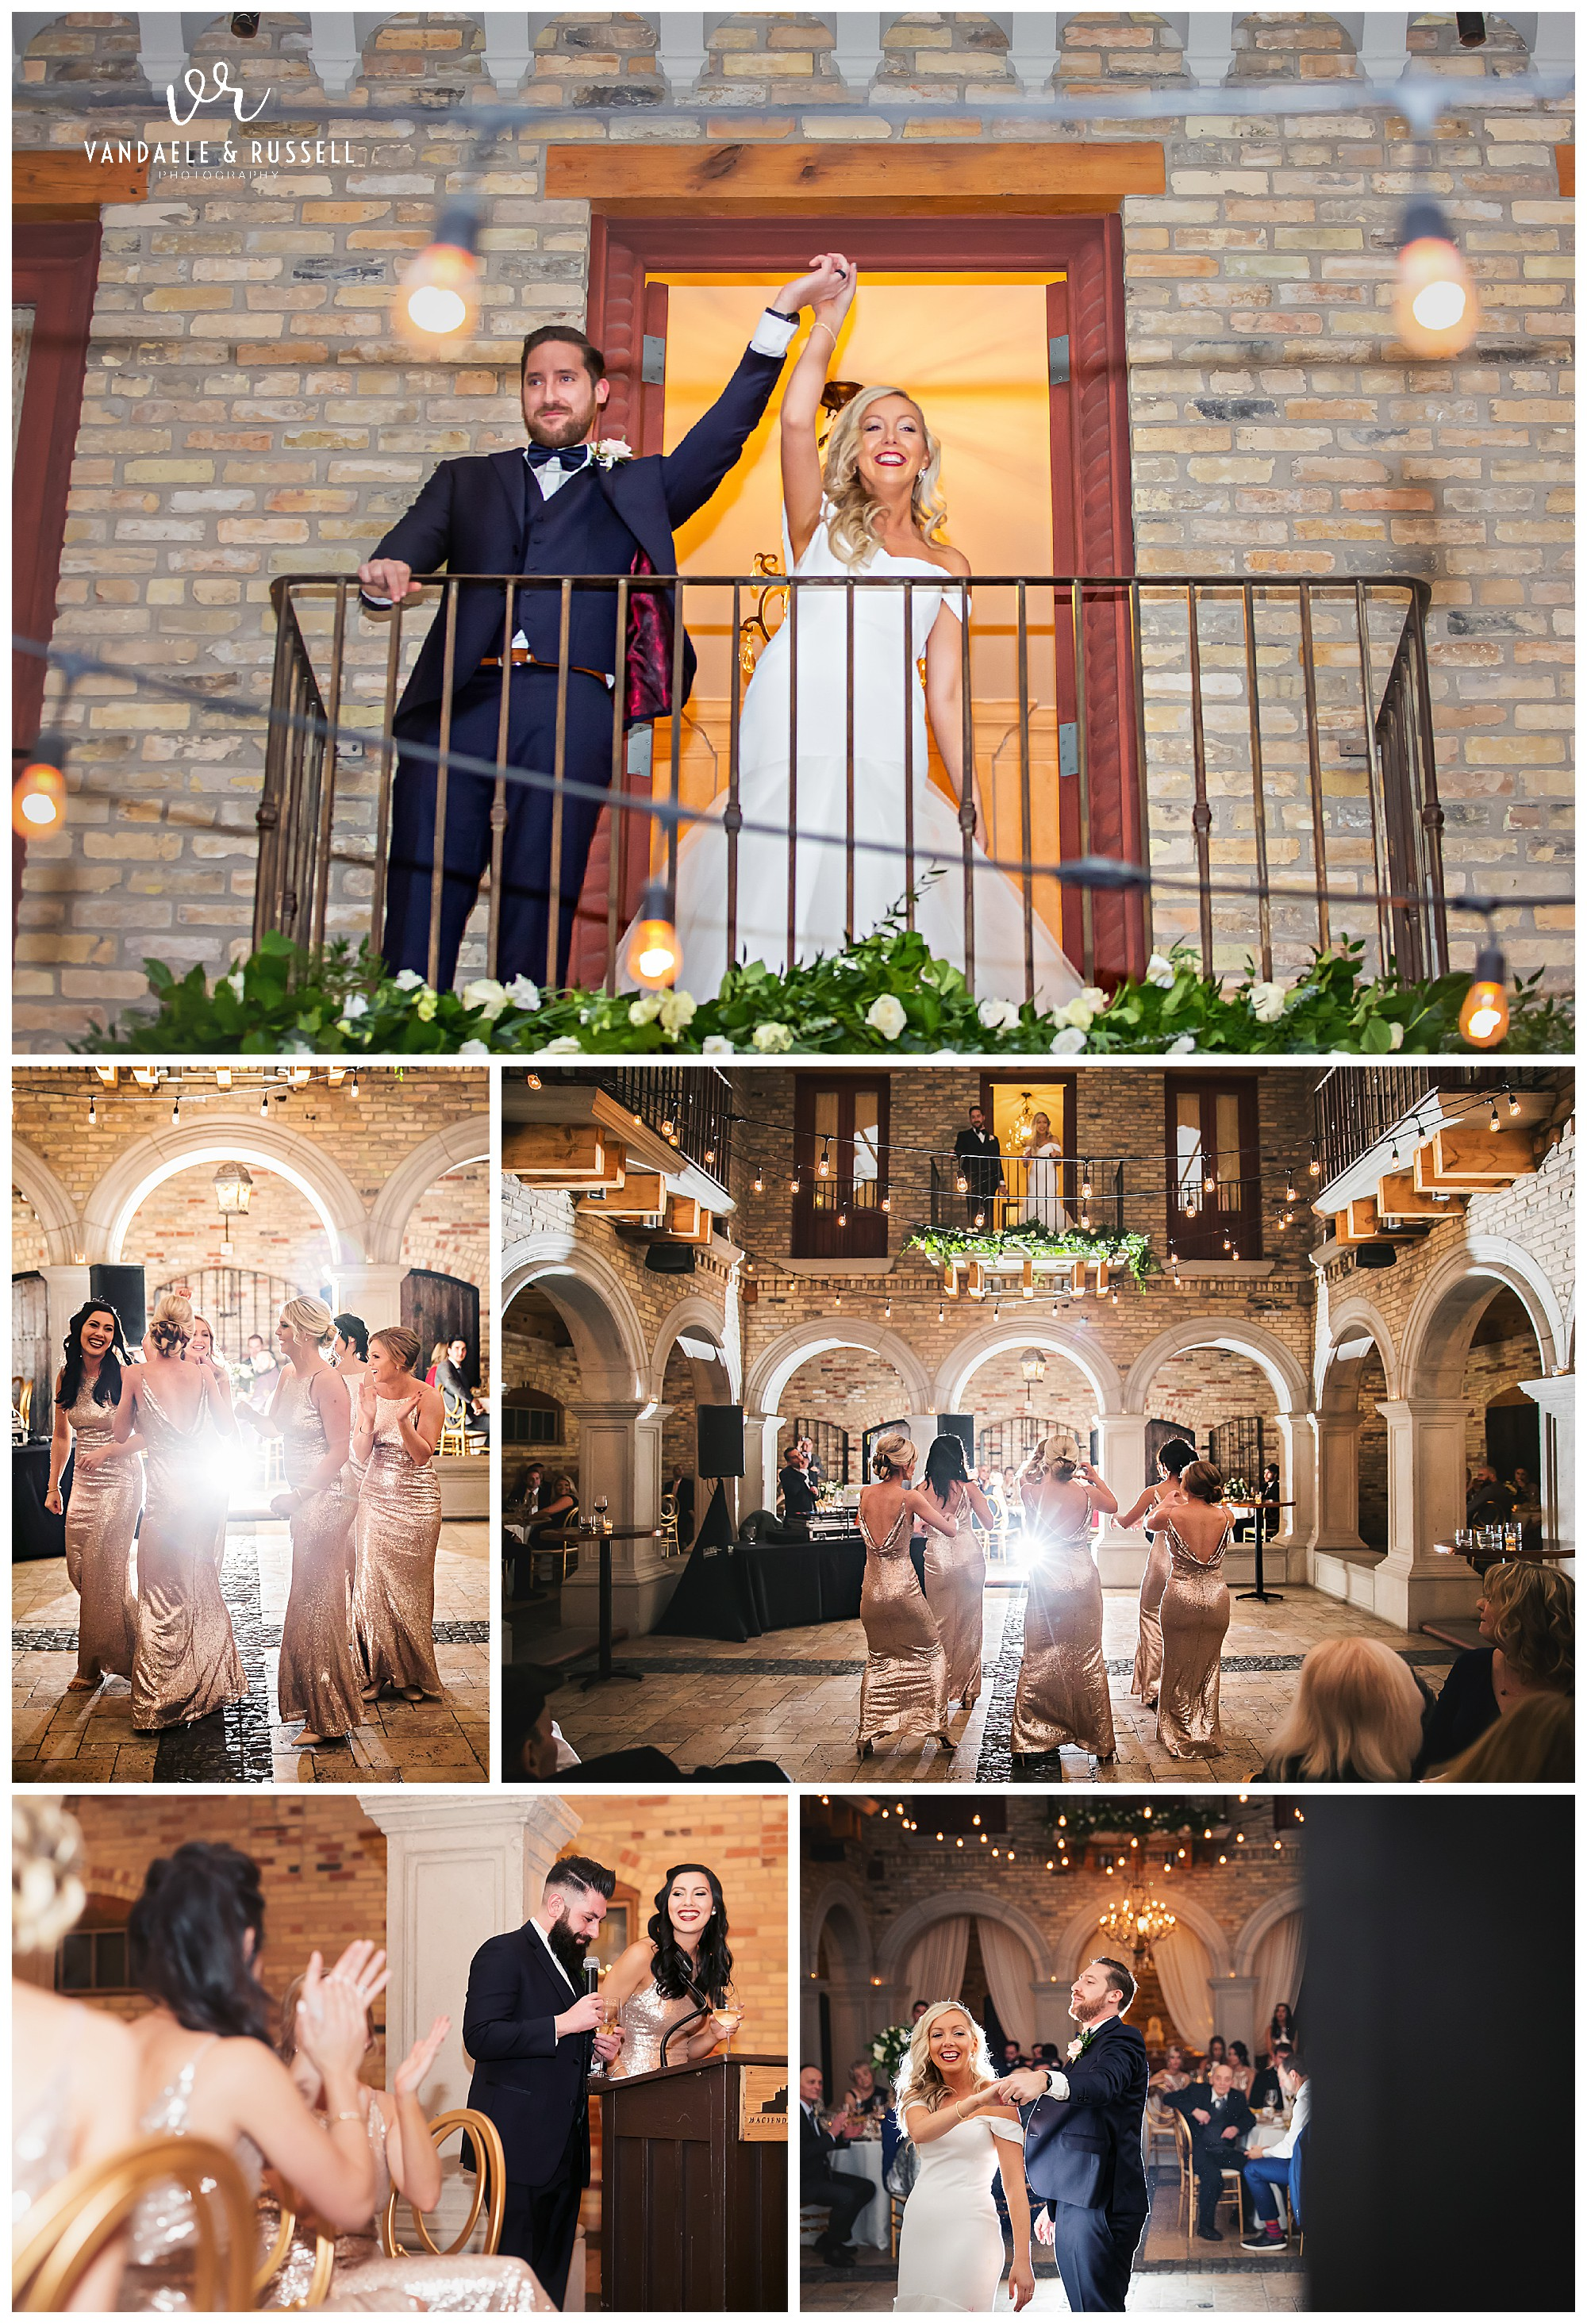 Hacienda-Sarria-Wedding-Photos-NYE-Michelle-Matt-VanDaele-Russell_0039.jpg